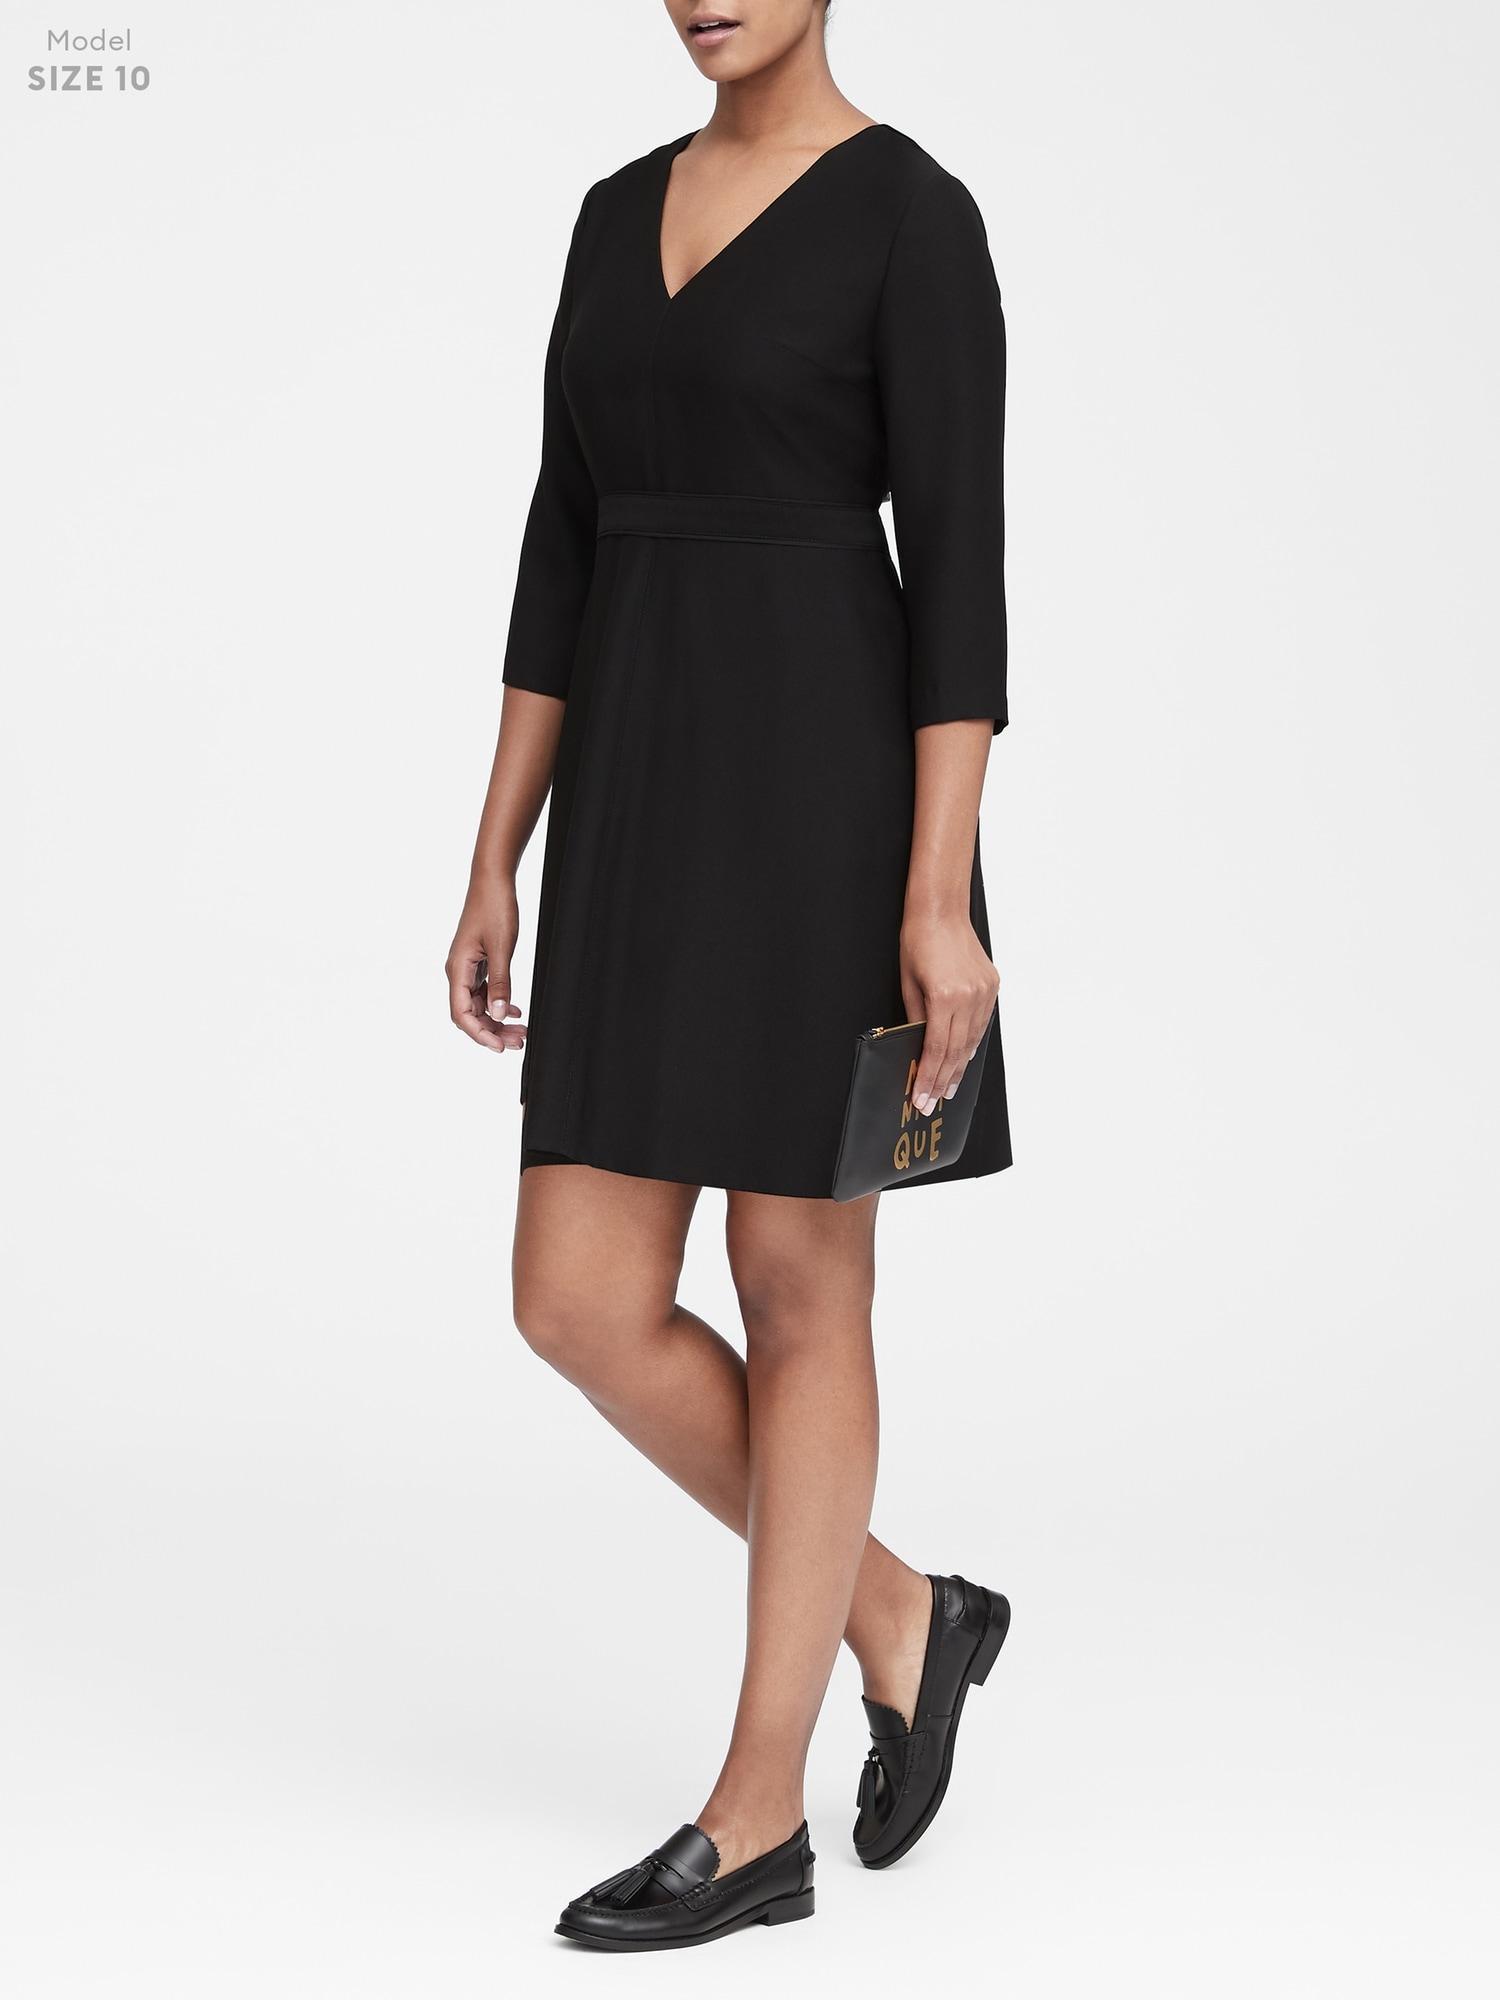 Banana Republic Women/'s Black Solid V-Neck Fit /& Flare Dress Size 10 Tall